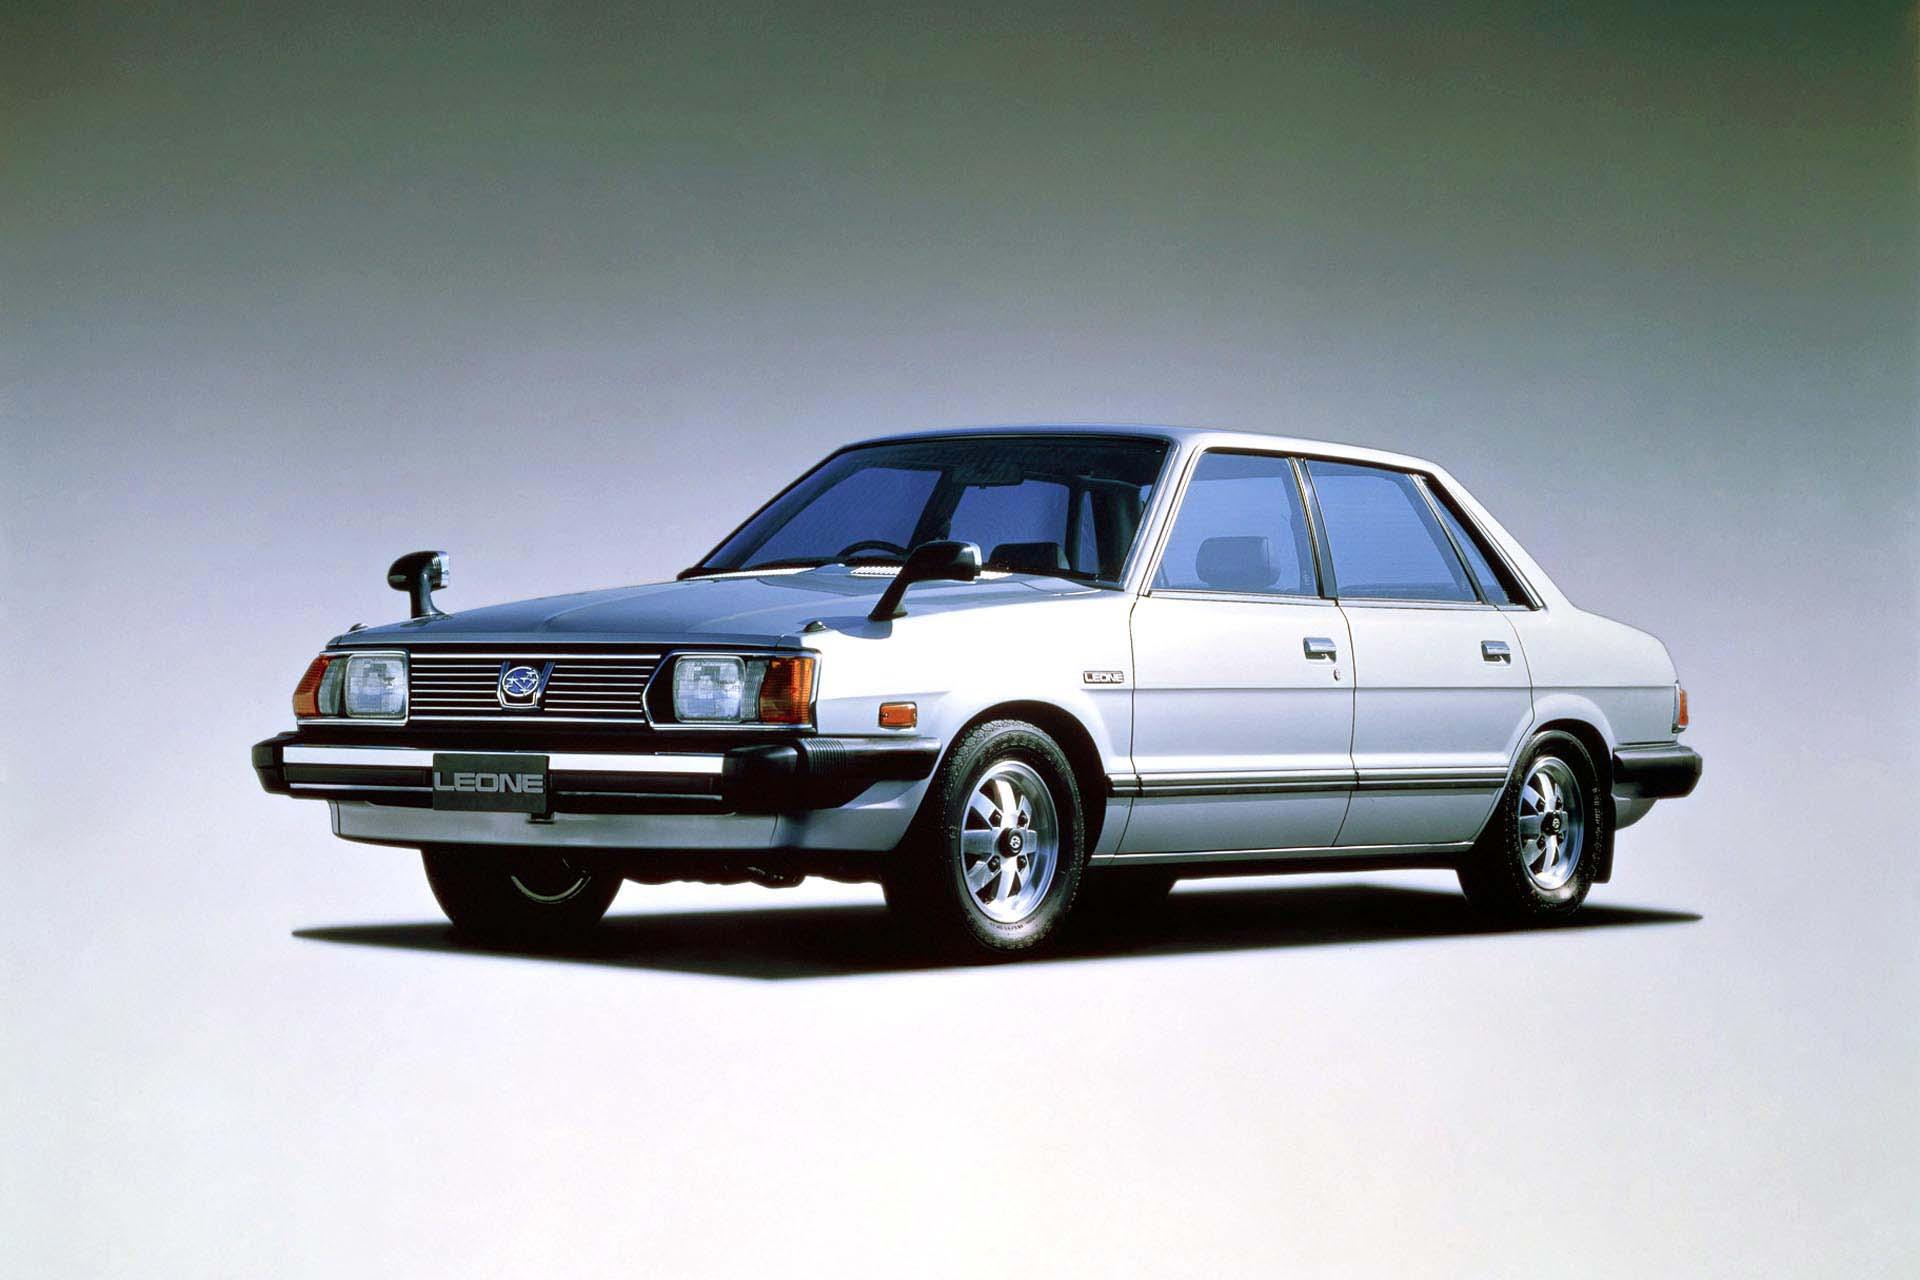 Sedan4d likewise C153 additionally  besides Courge Spaghetti moreover 03 1979 Subaru Leone. on 2010 mercedes wagon